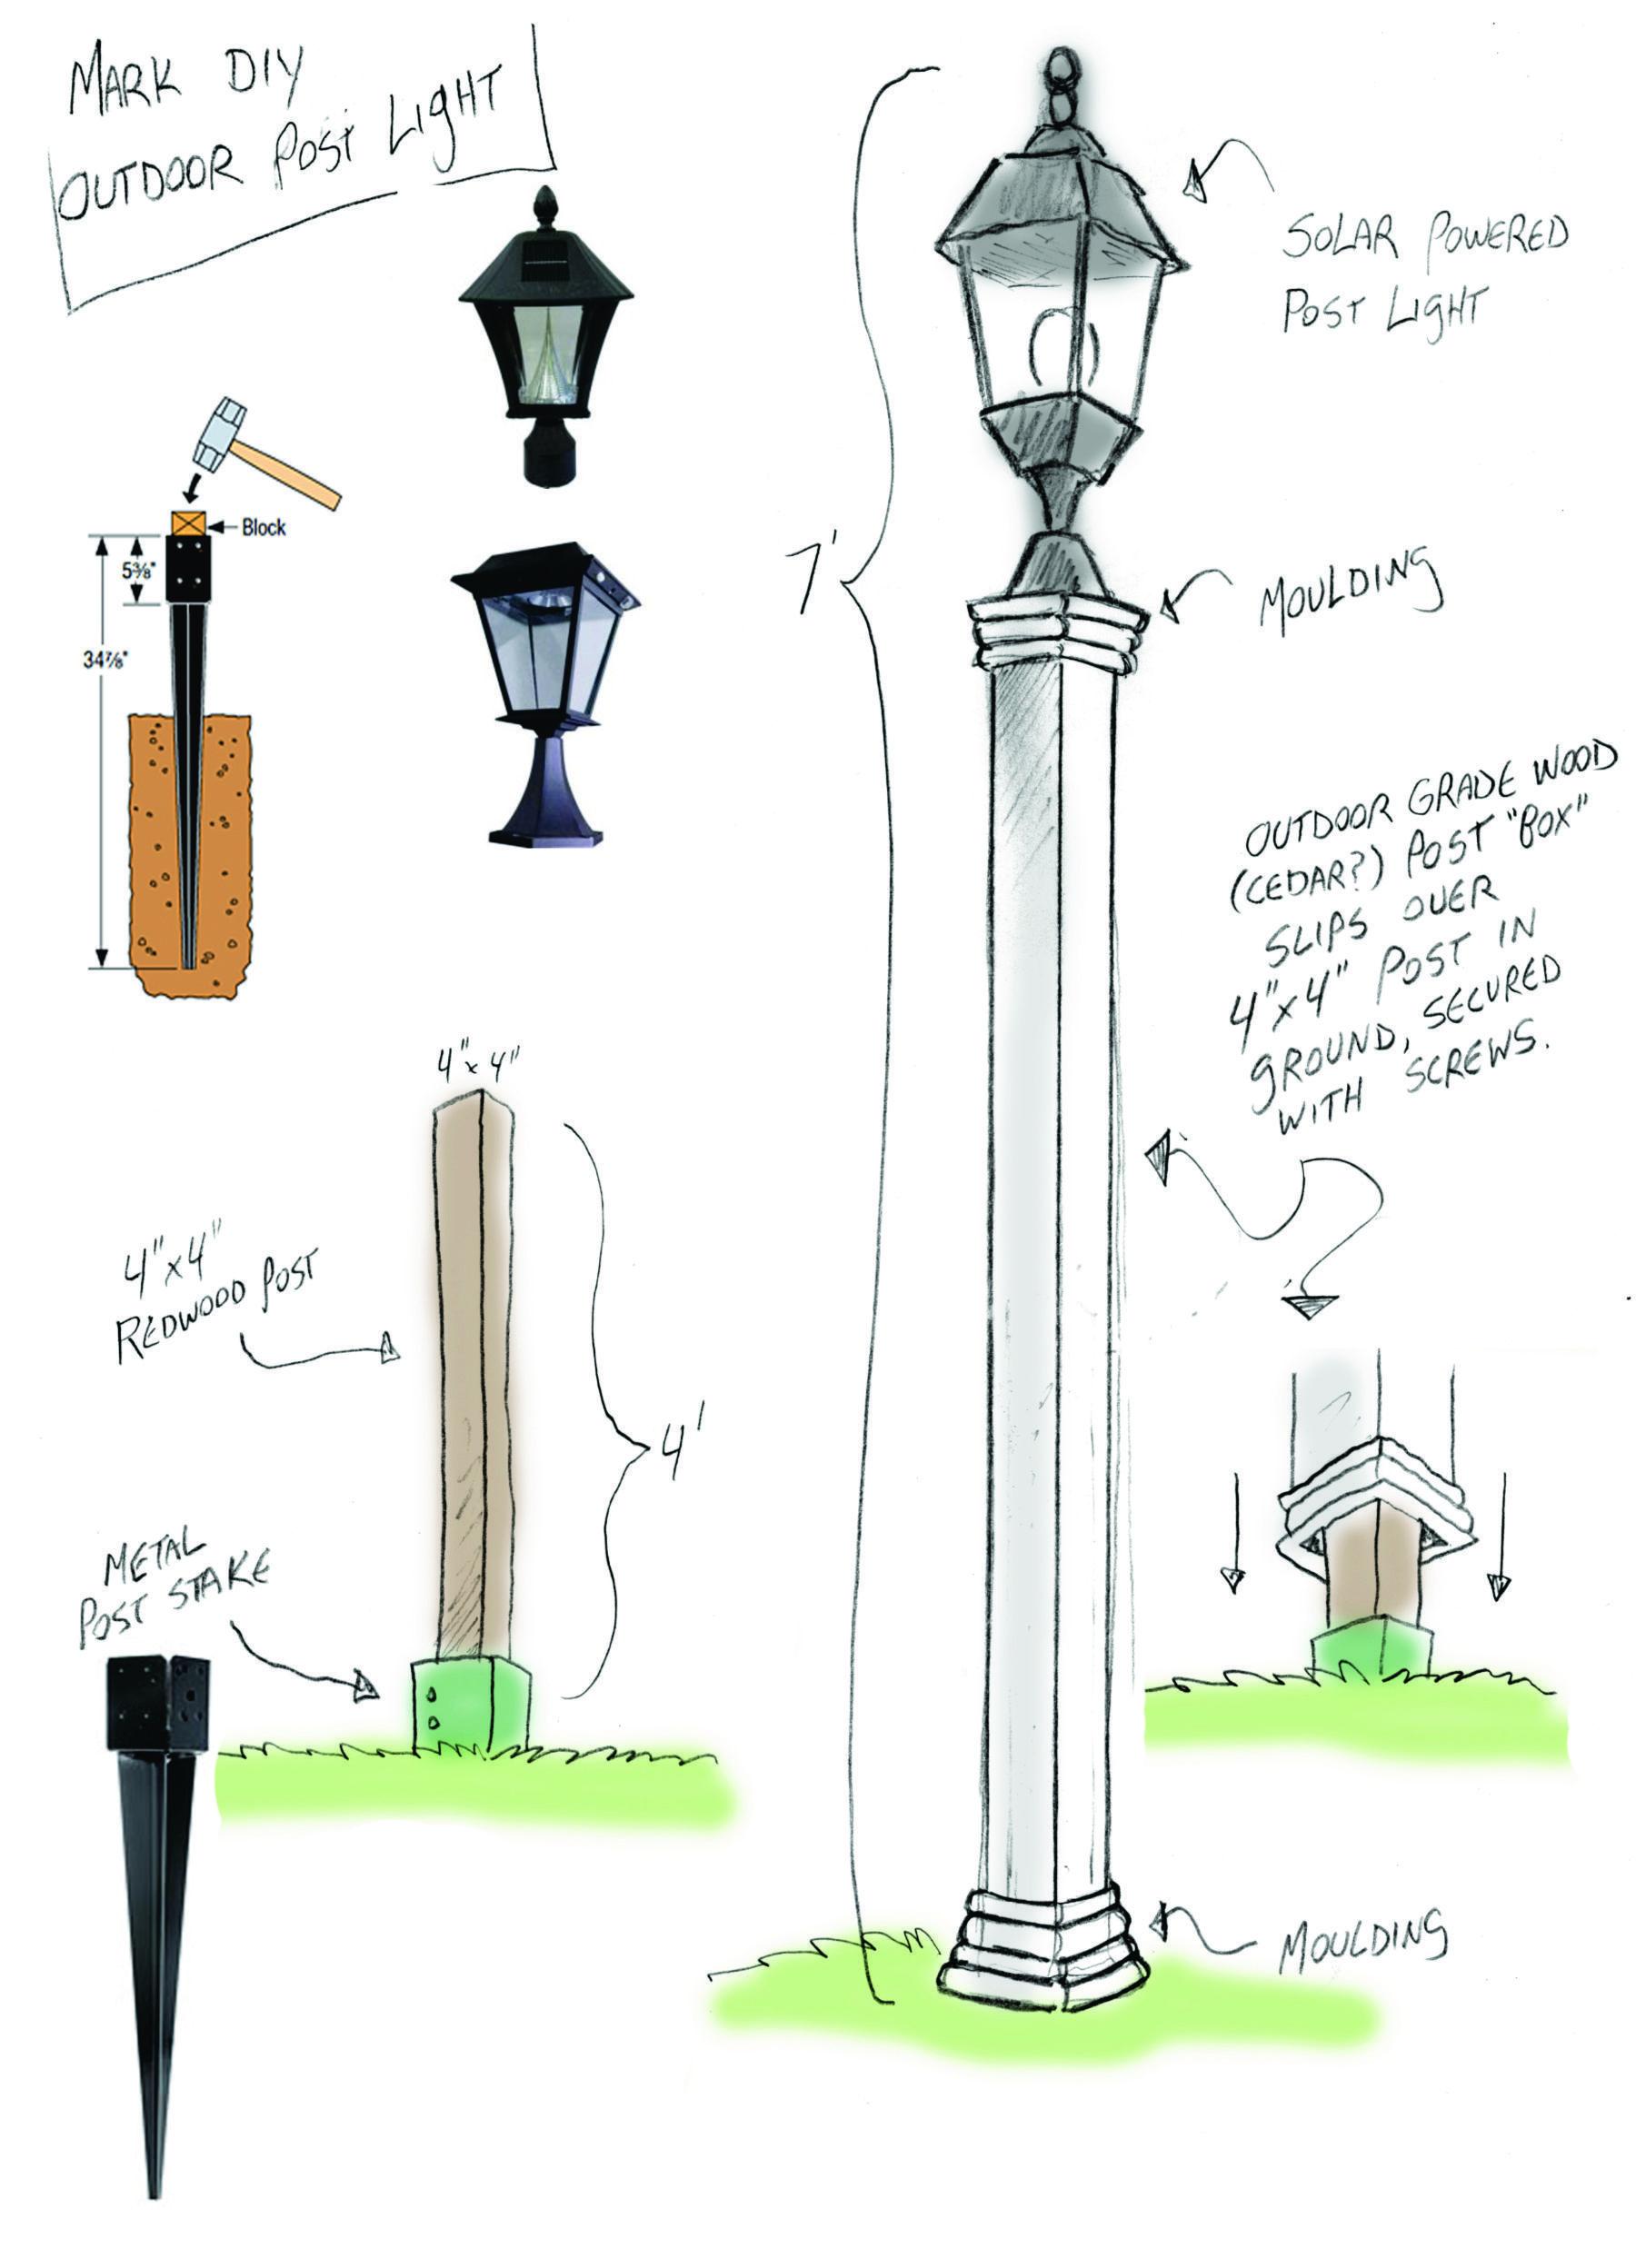 15 Diy Ideas To Refresh Your Living Room 6 Woodlamp Postsolarlights Diy Outdoor Lighting Solar Lights Diy Front Yards Diy